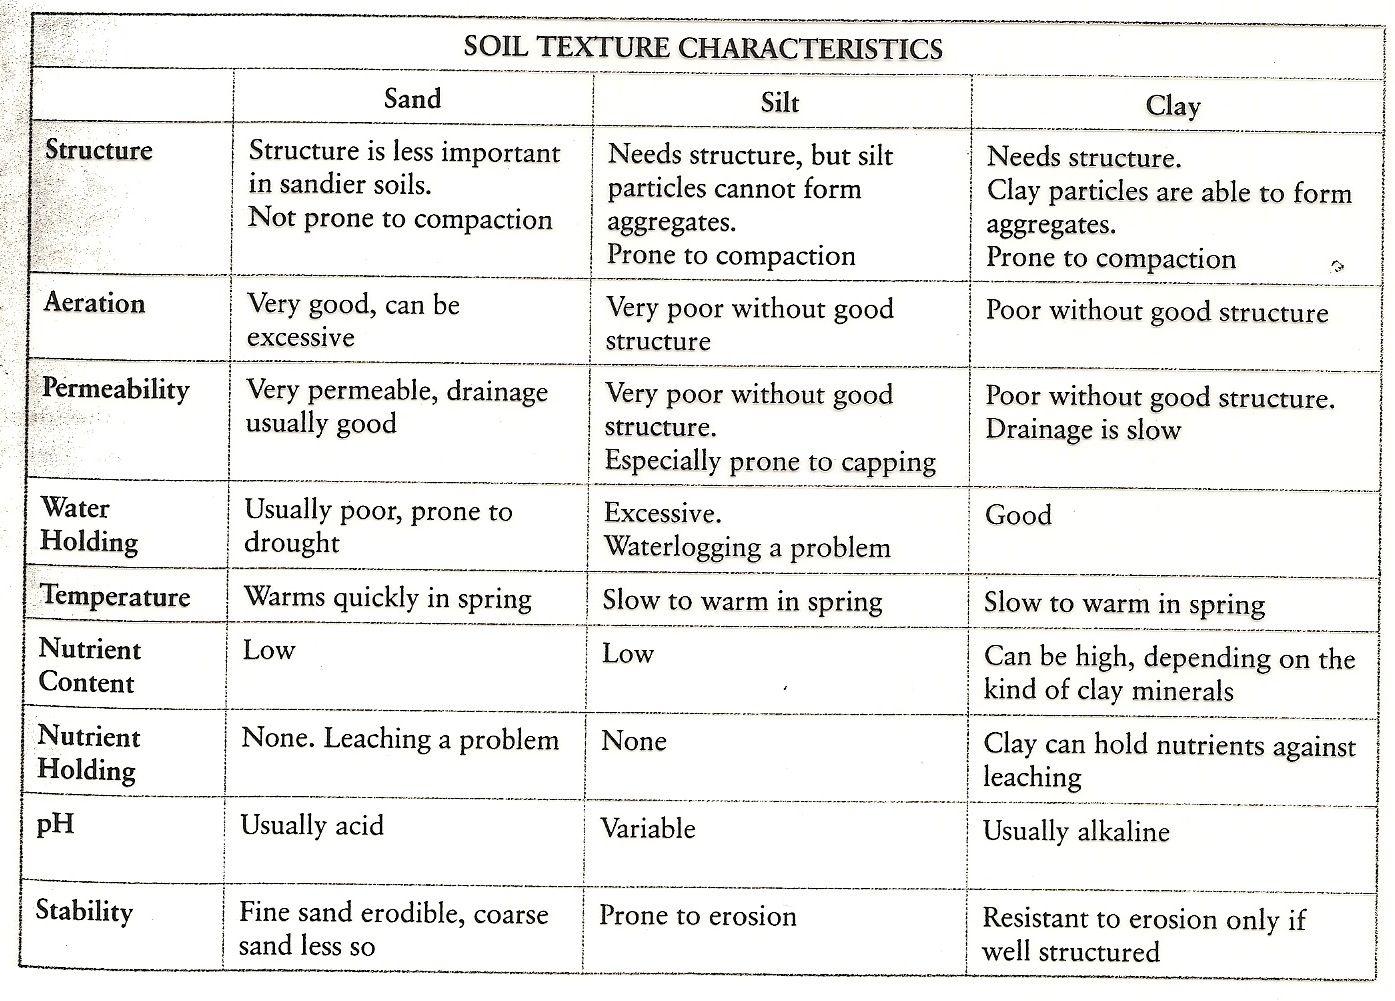 soil texture indicators and characteristics chart Soil